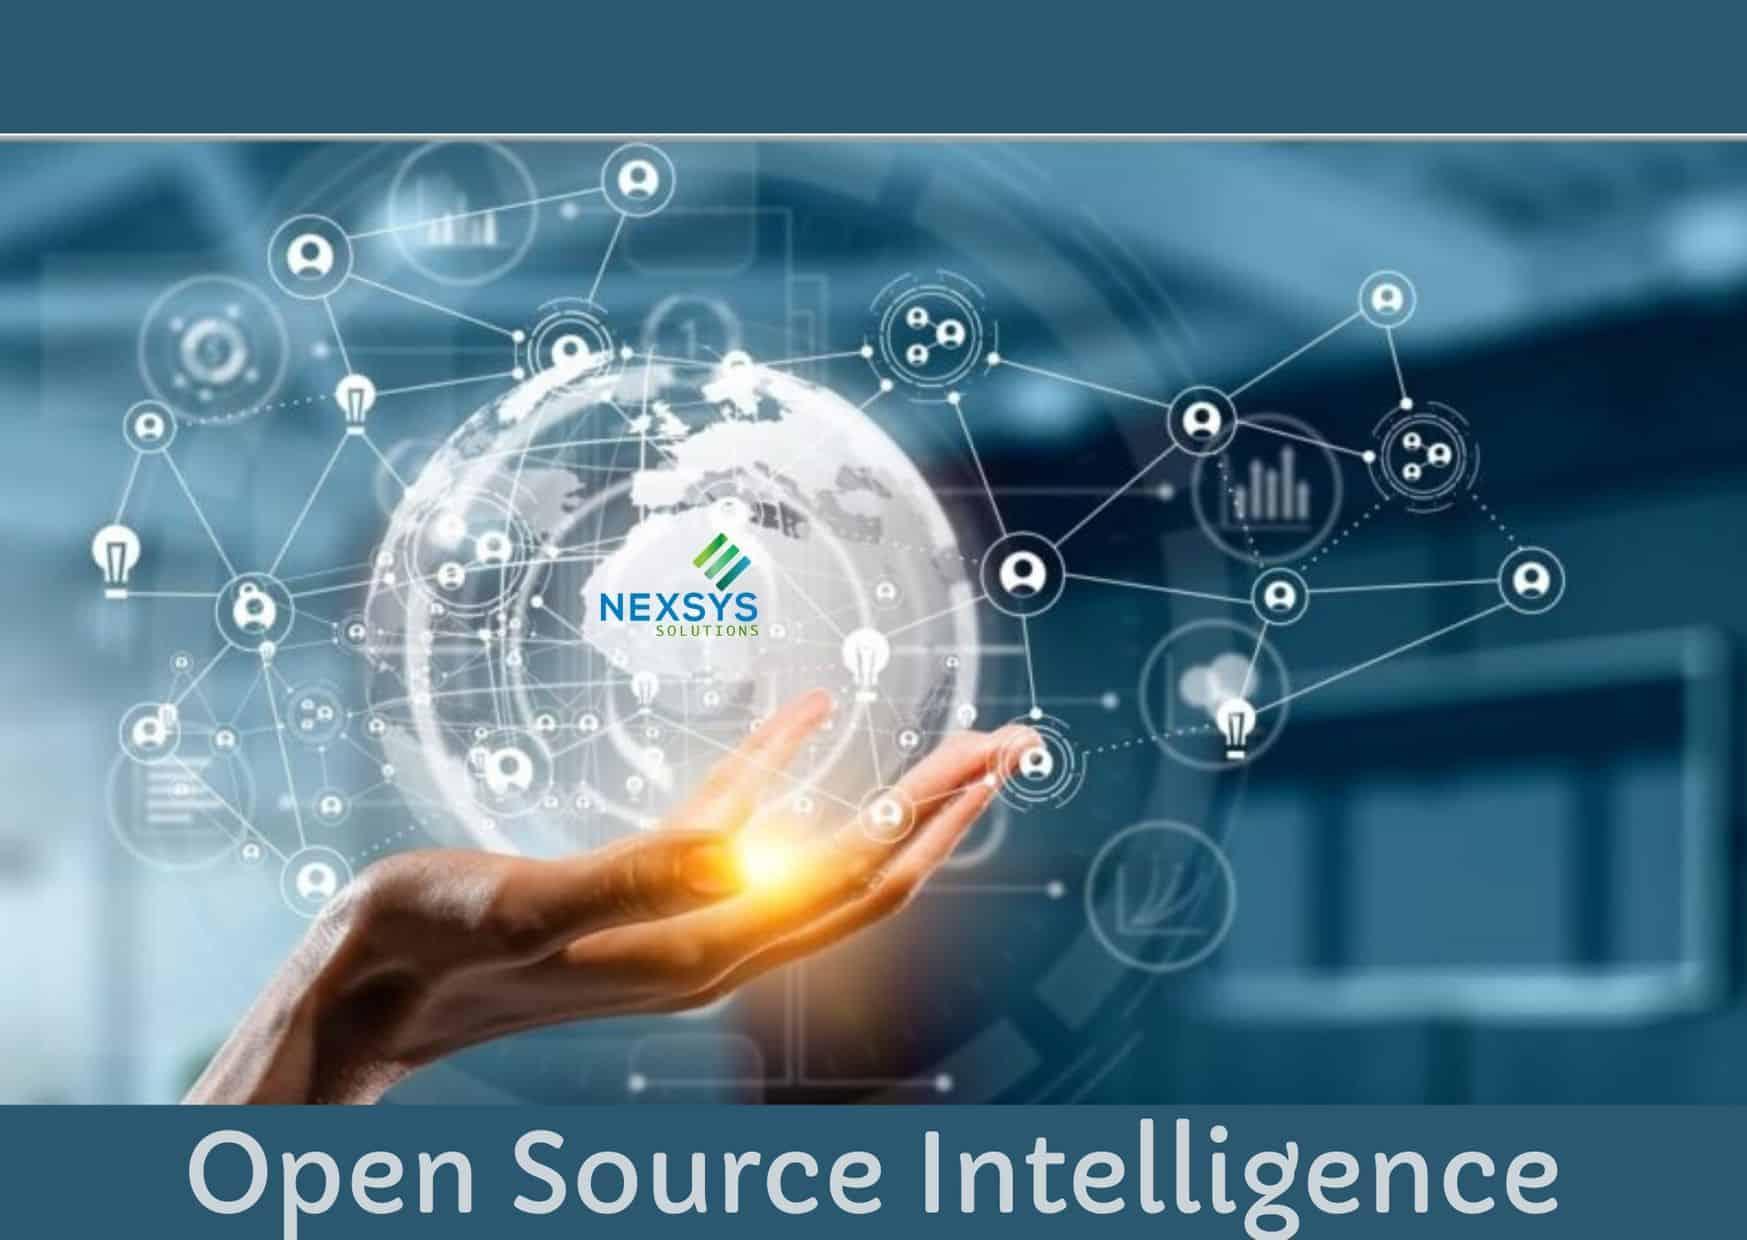 OSINT (Open Source Intelligence) cos'è e come funziona